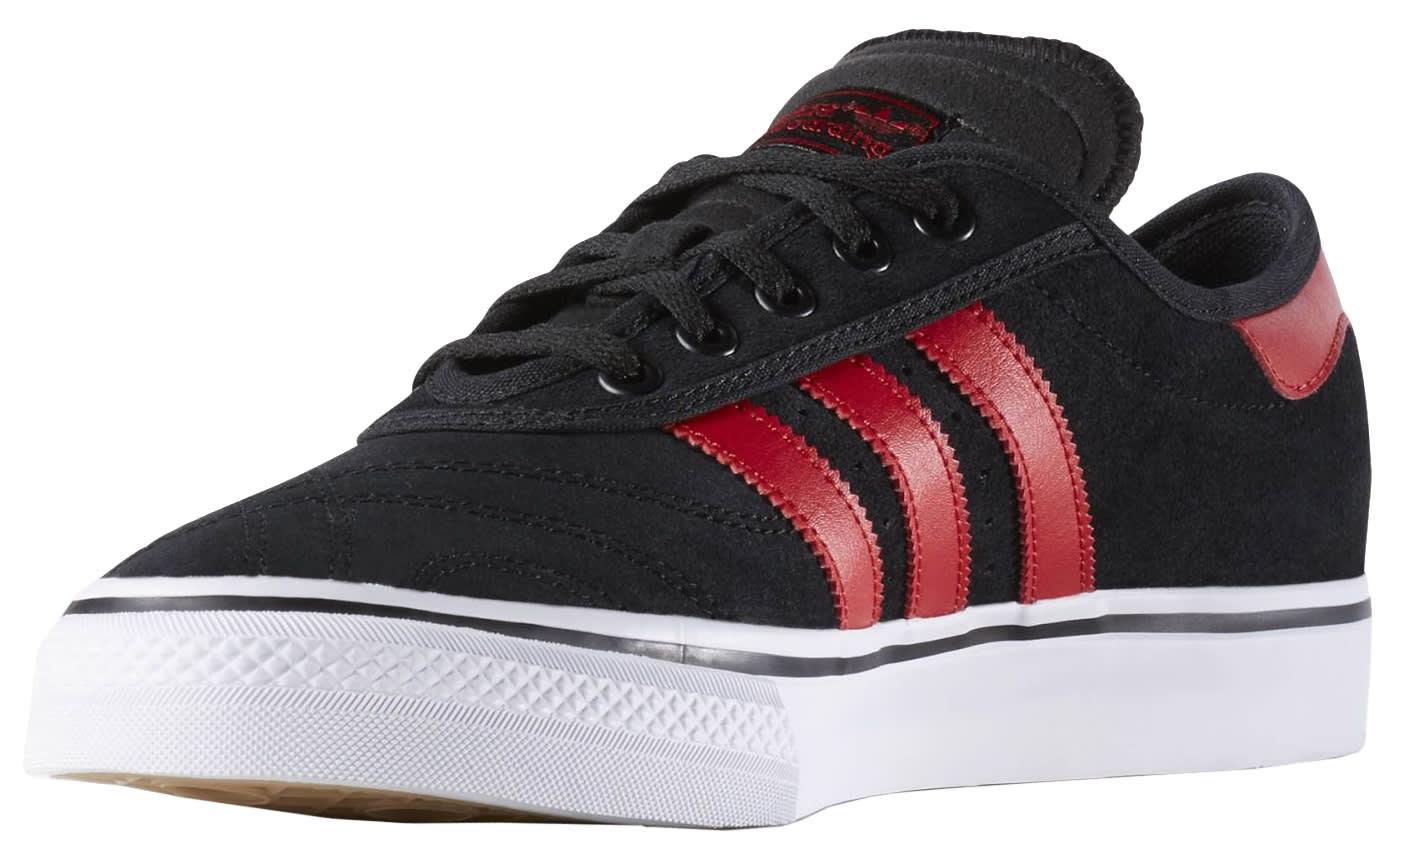 promo code a7a20 f69e8 Adidas Adi-Ease Premiere ADV Skate Shoes - thumbnail 2